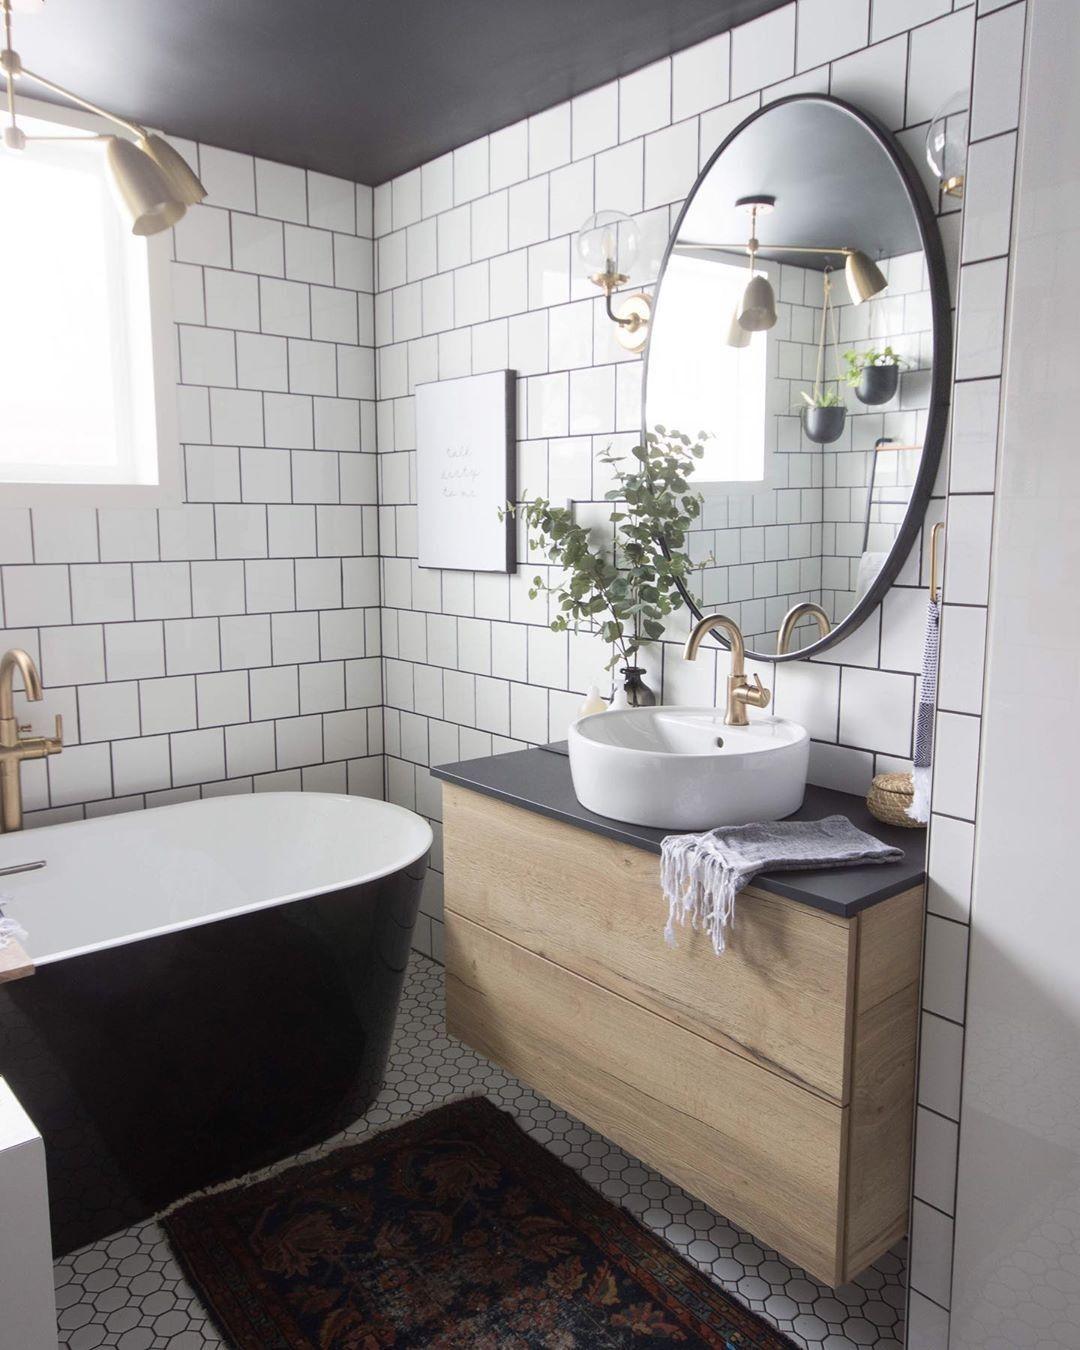 Pin de Entorno Baño en Baños que Inspiran | Cuarto de baño ...